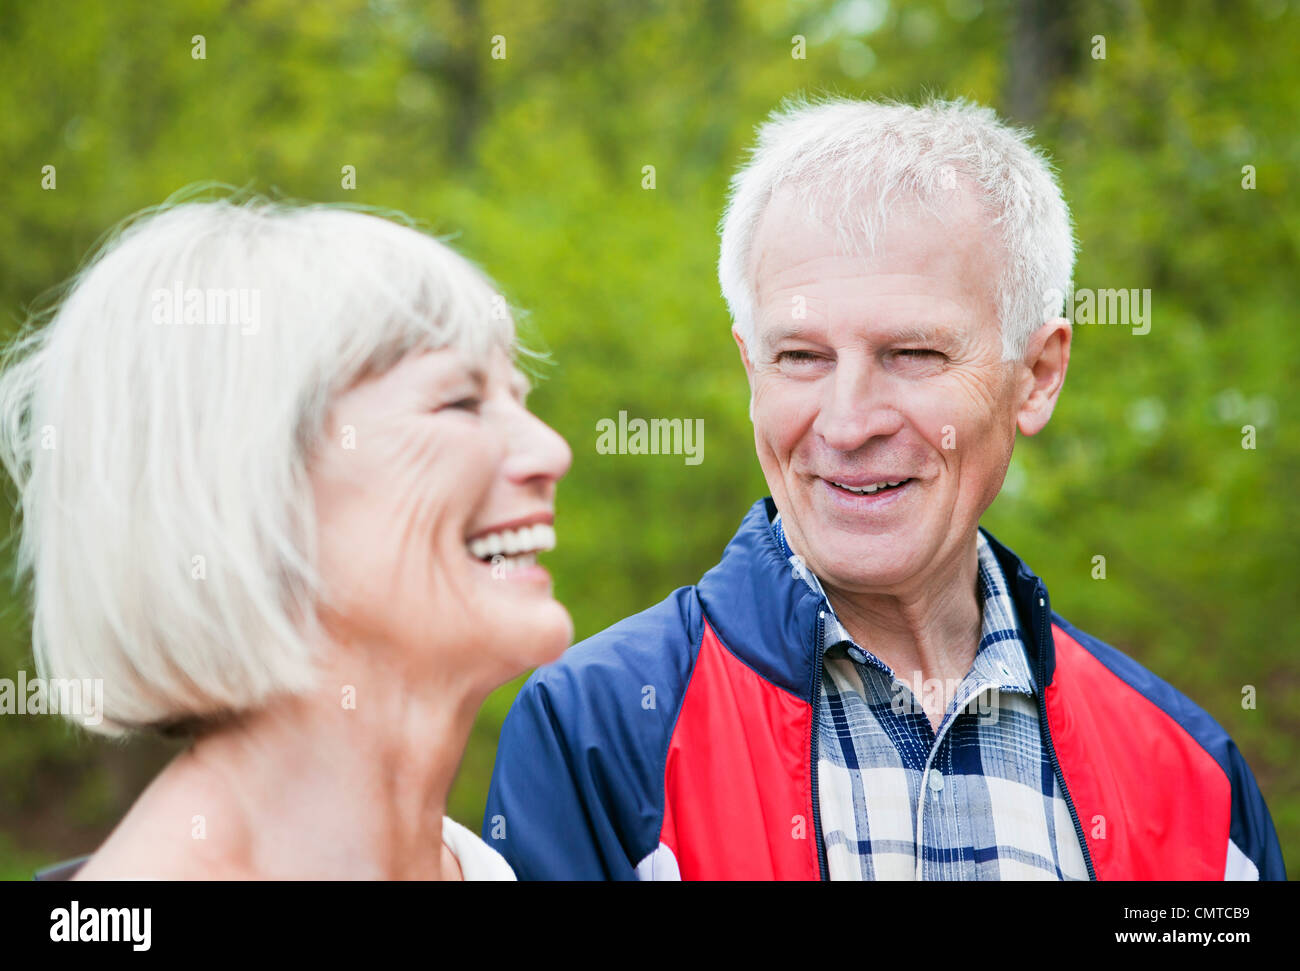 Two smiling senior citizen laughing - Stock Image